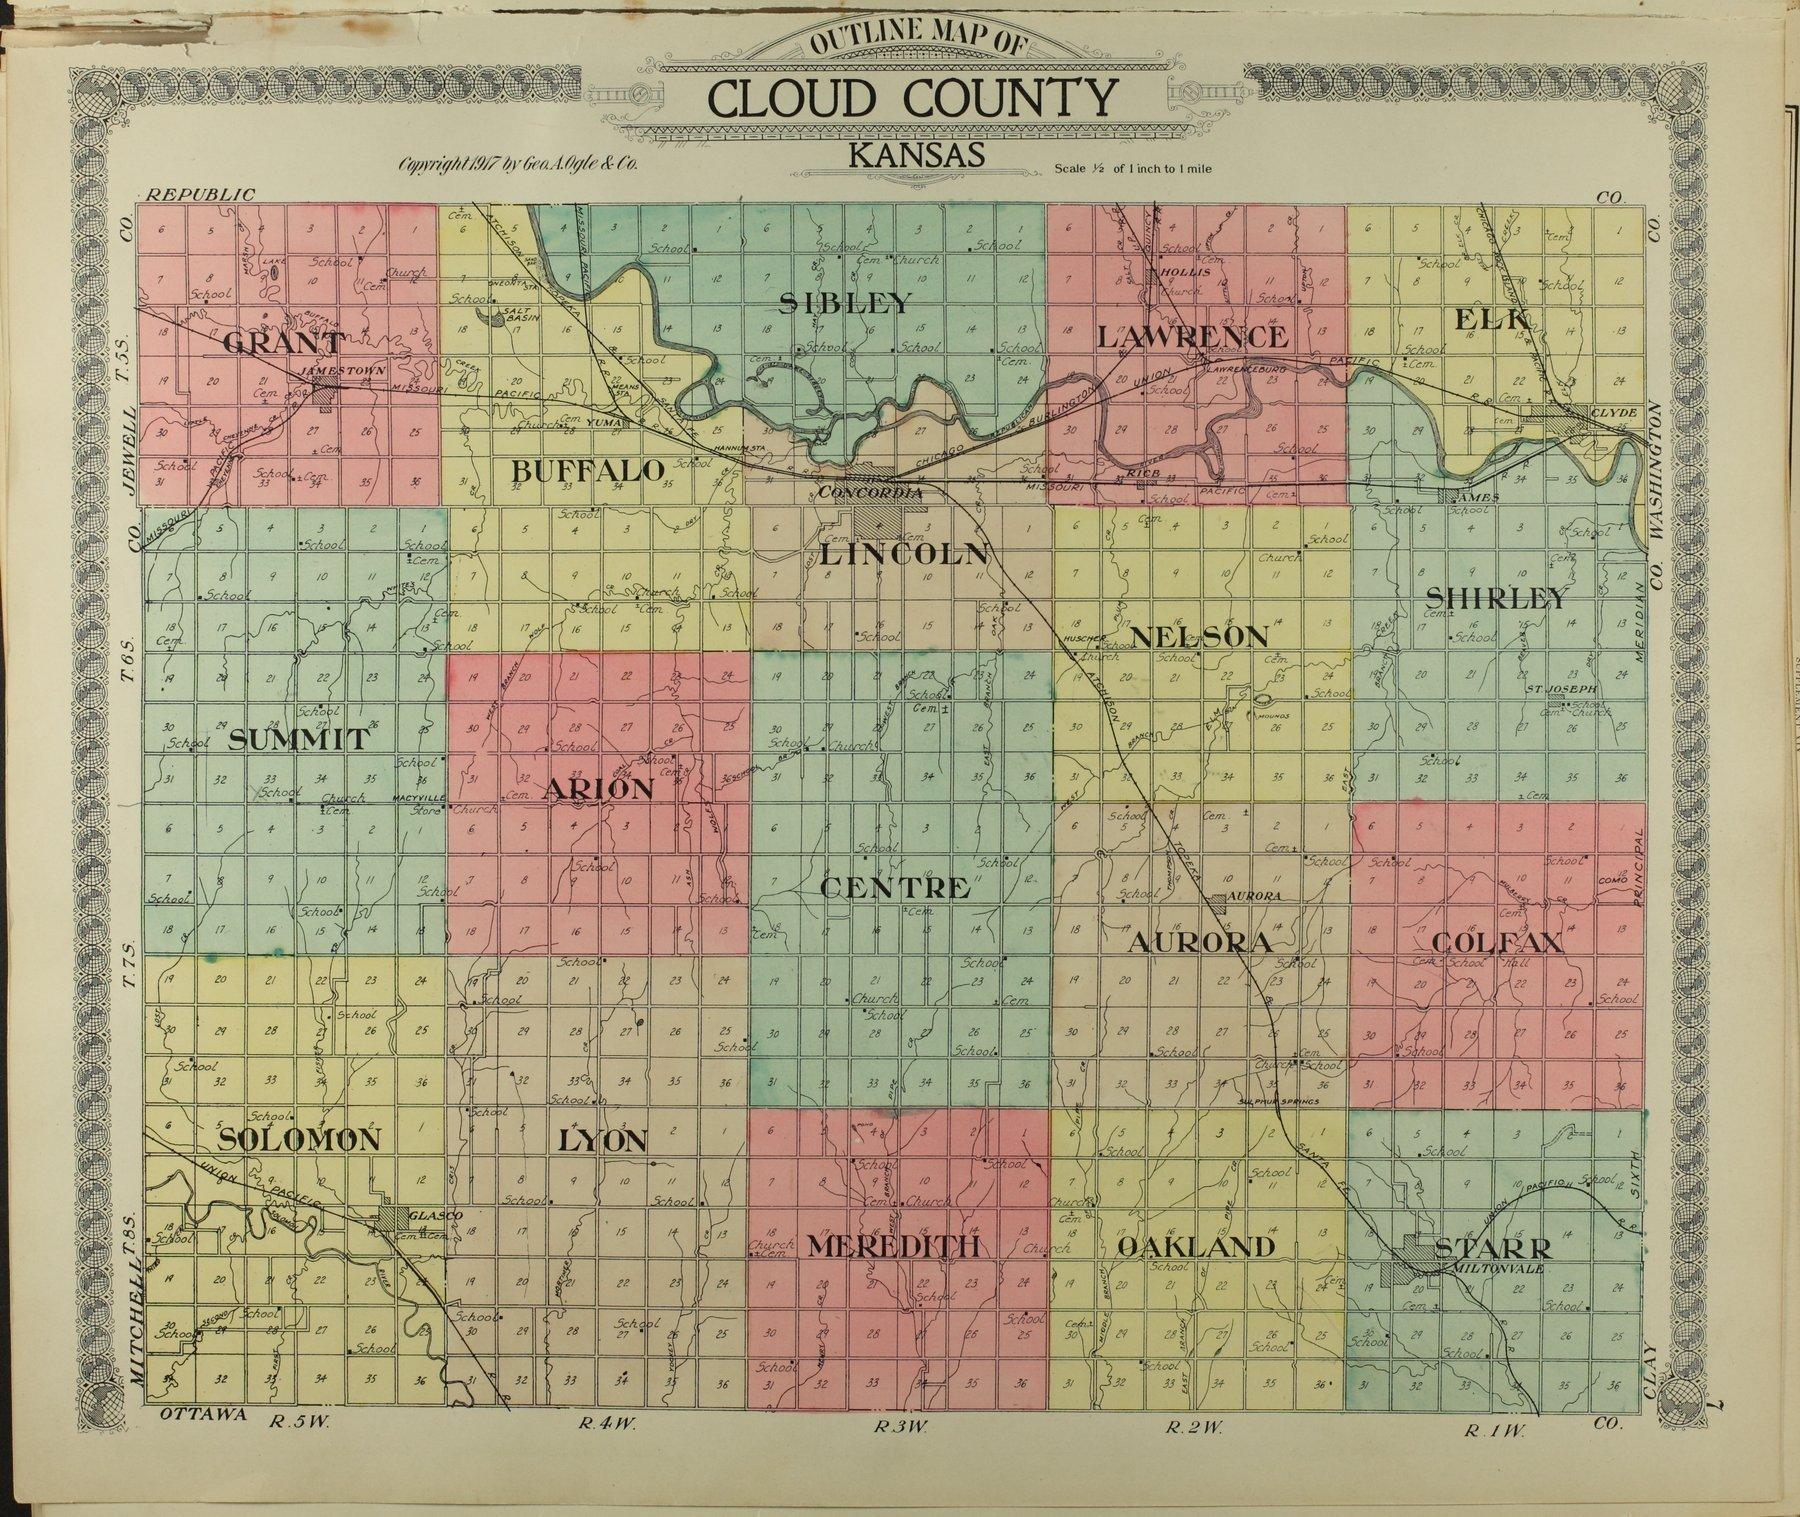 Standard atlas of Cloud County, Kansas - 7